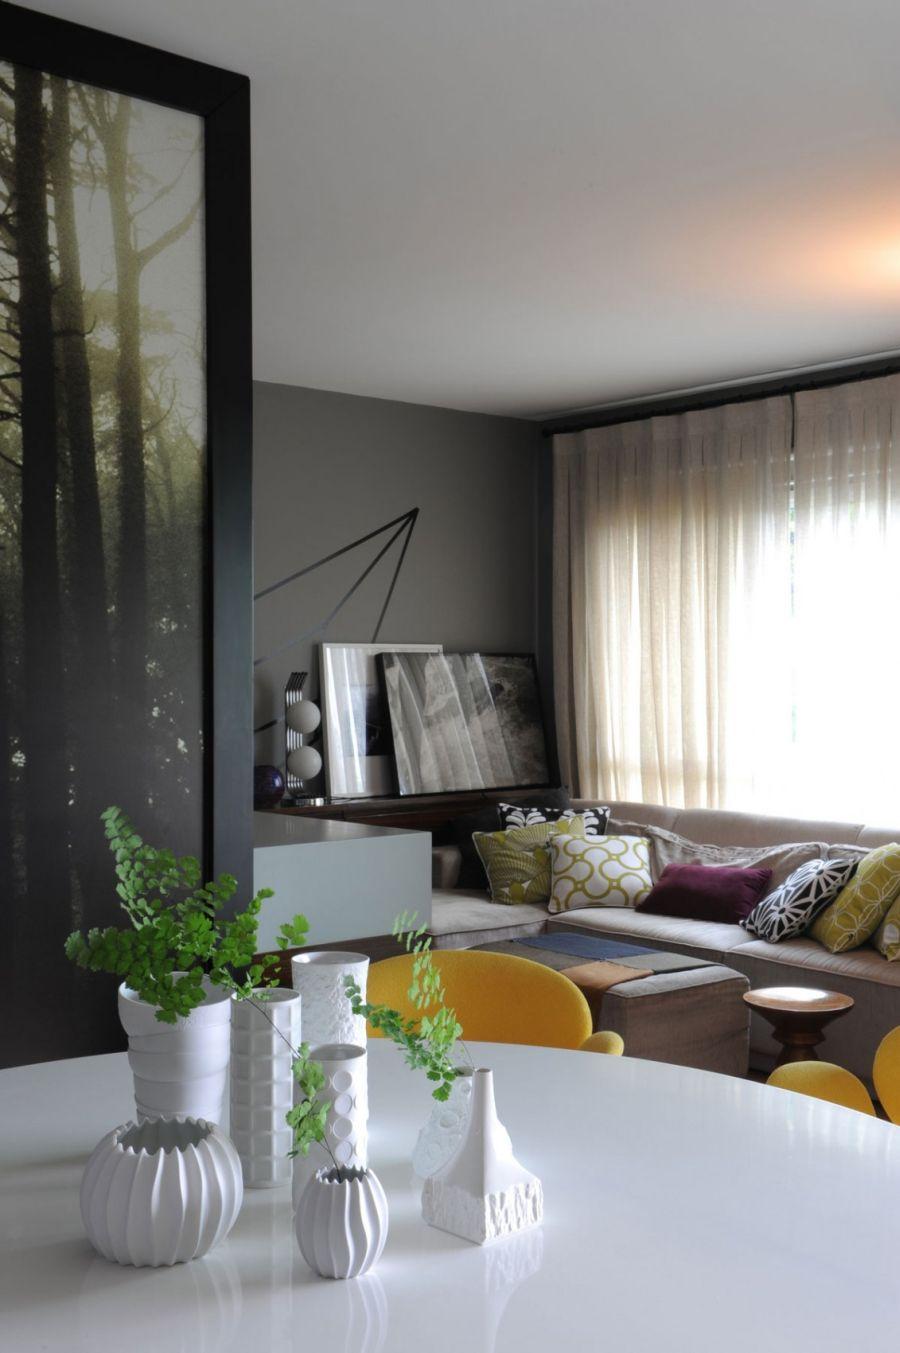 Gray walls make a lovely backdrop